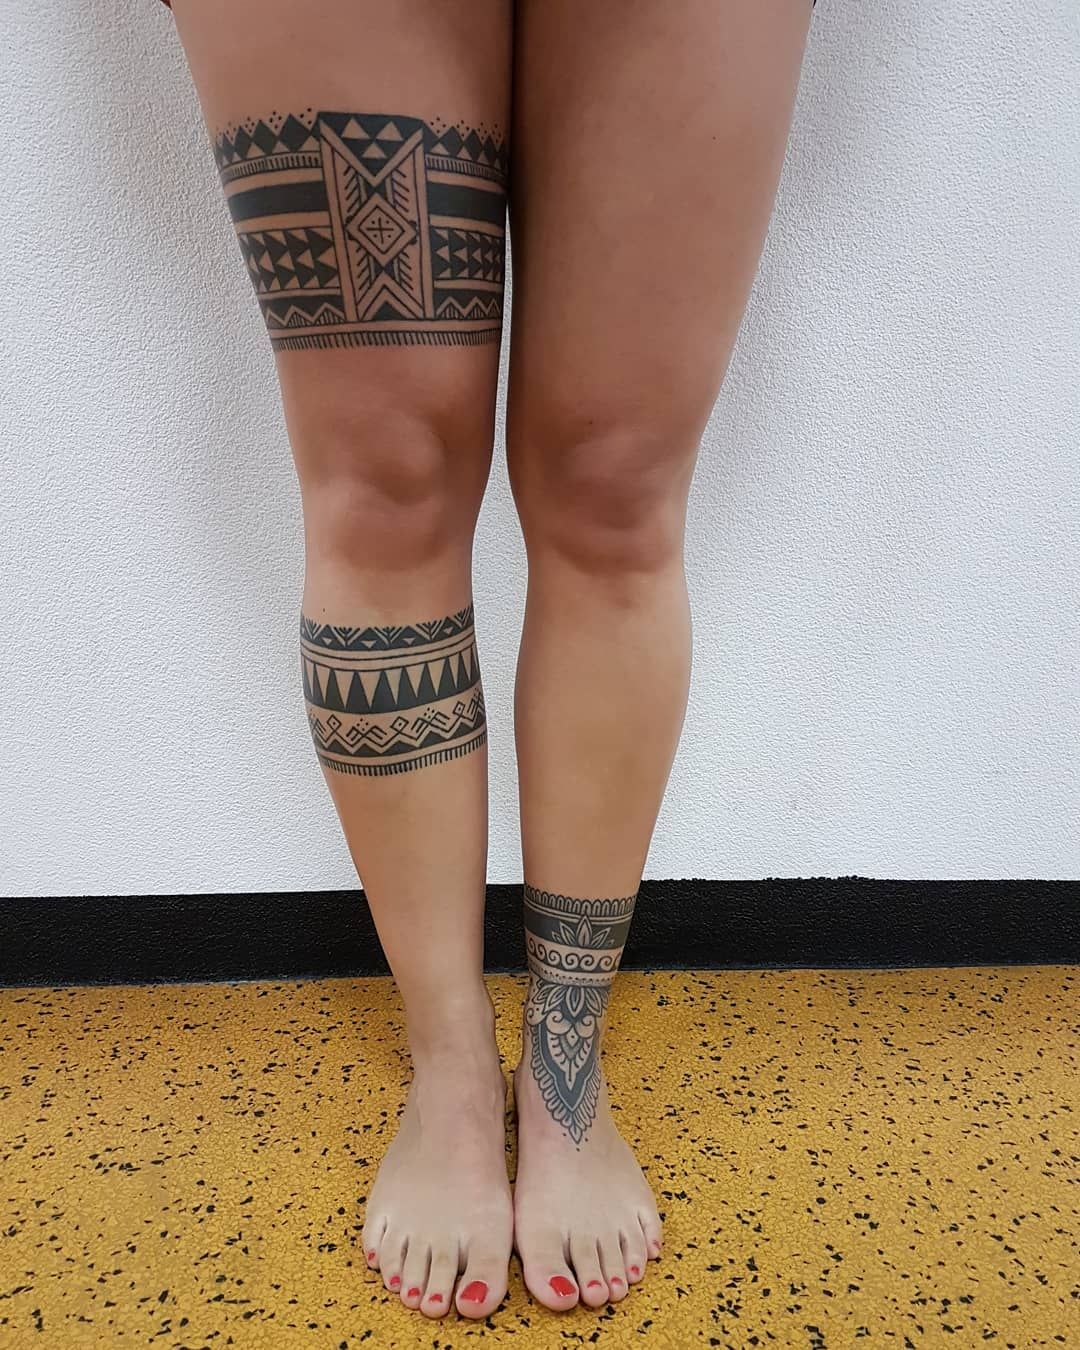 Gambar Mungkin Berisi Satu Orang Atau Lebih Dan Sepatu Polynesian Tattoos Women Leg Band Tattoos Anklet Tattoos